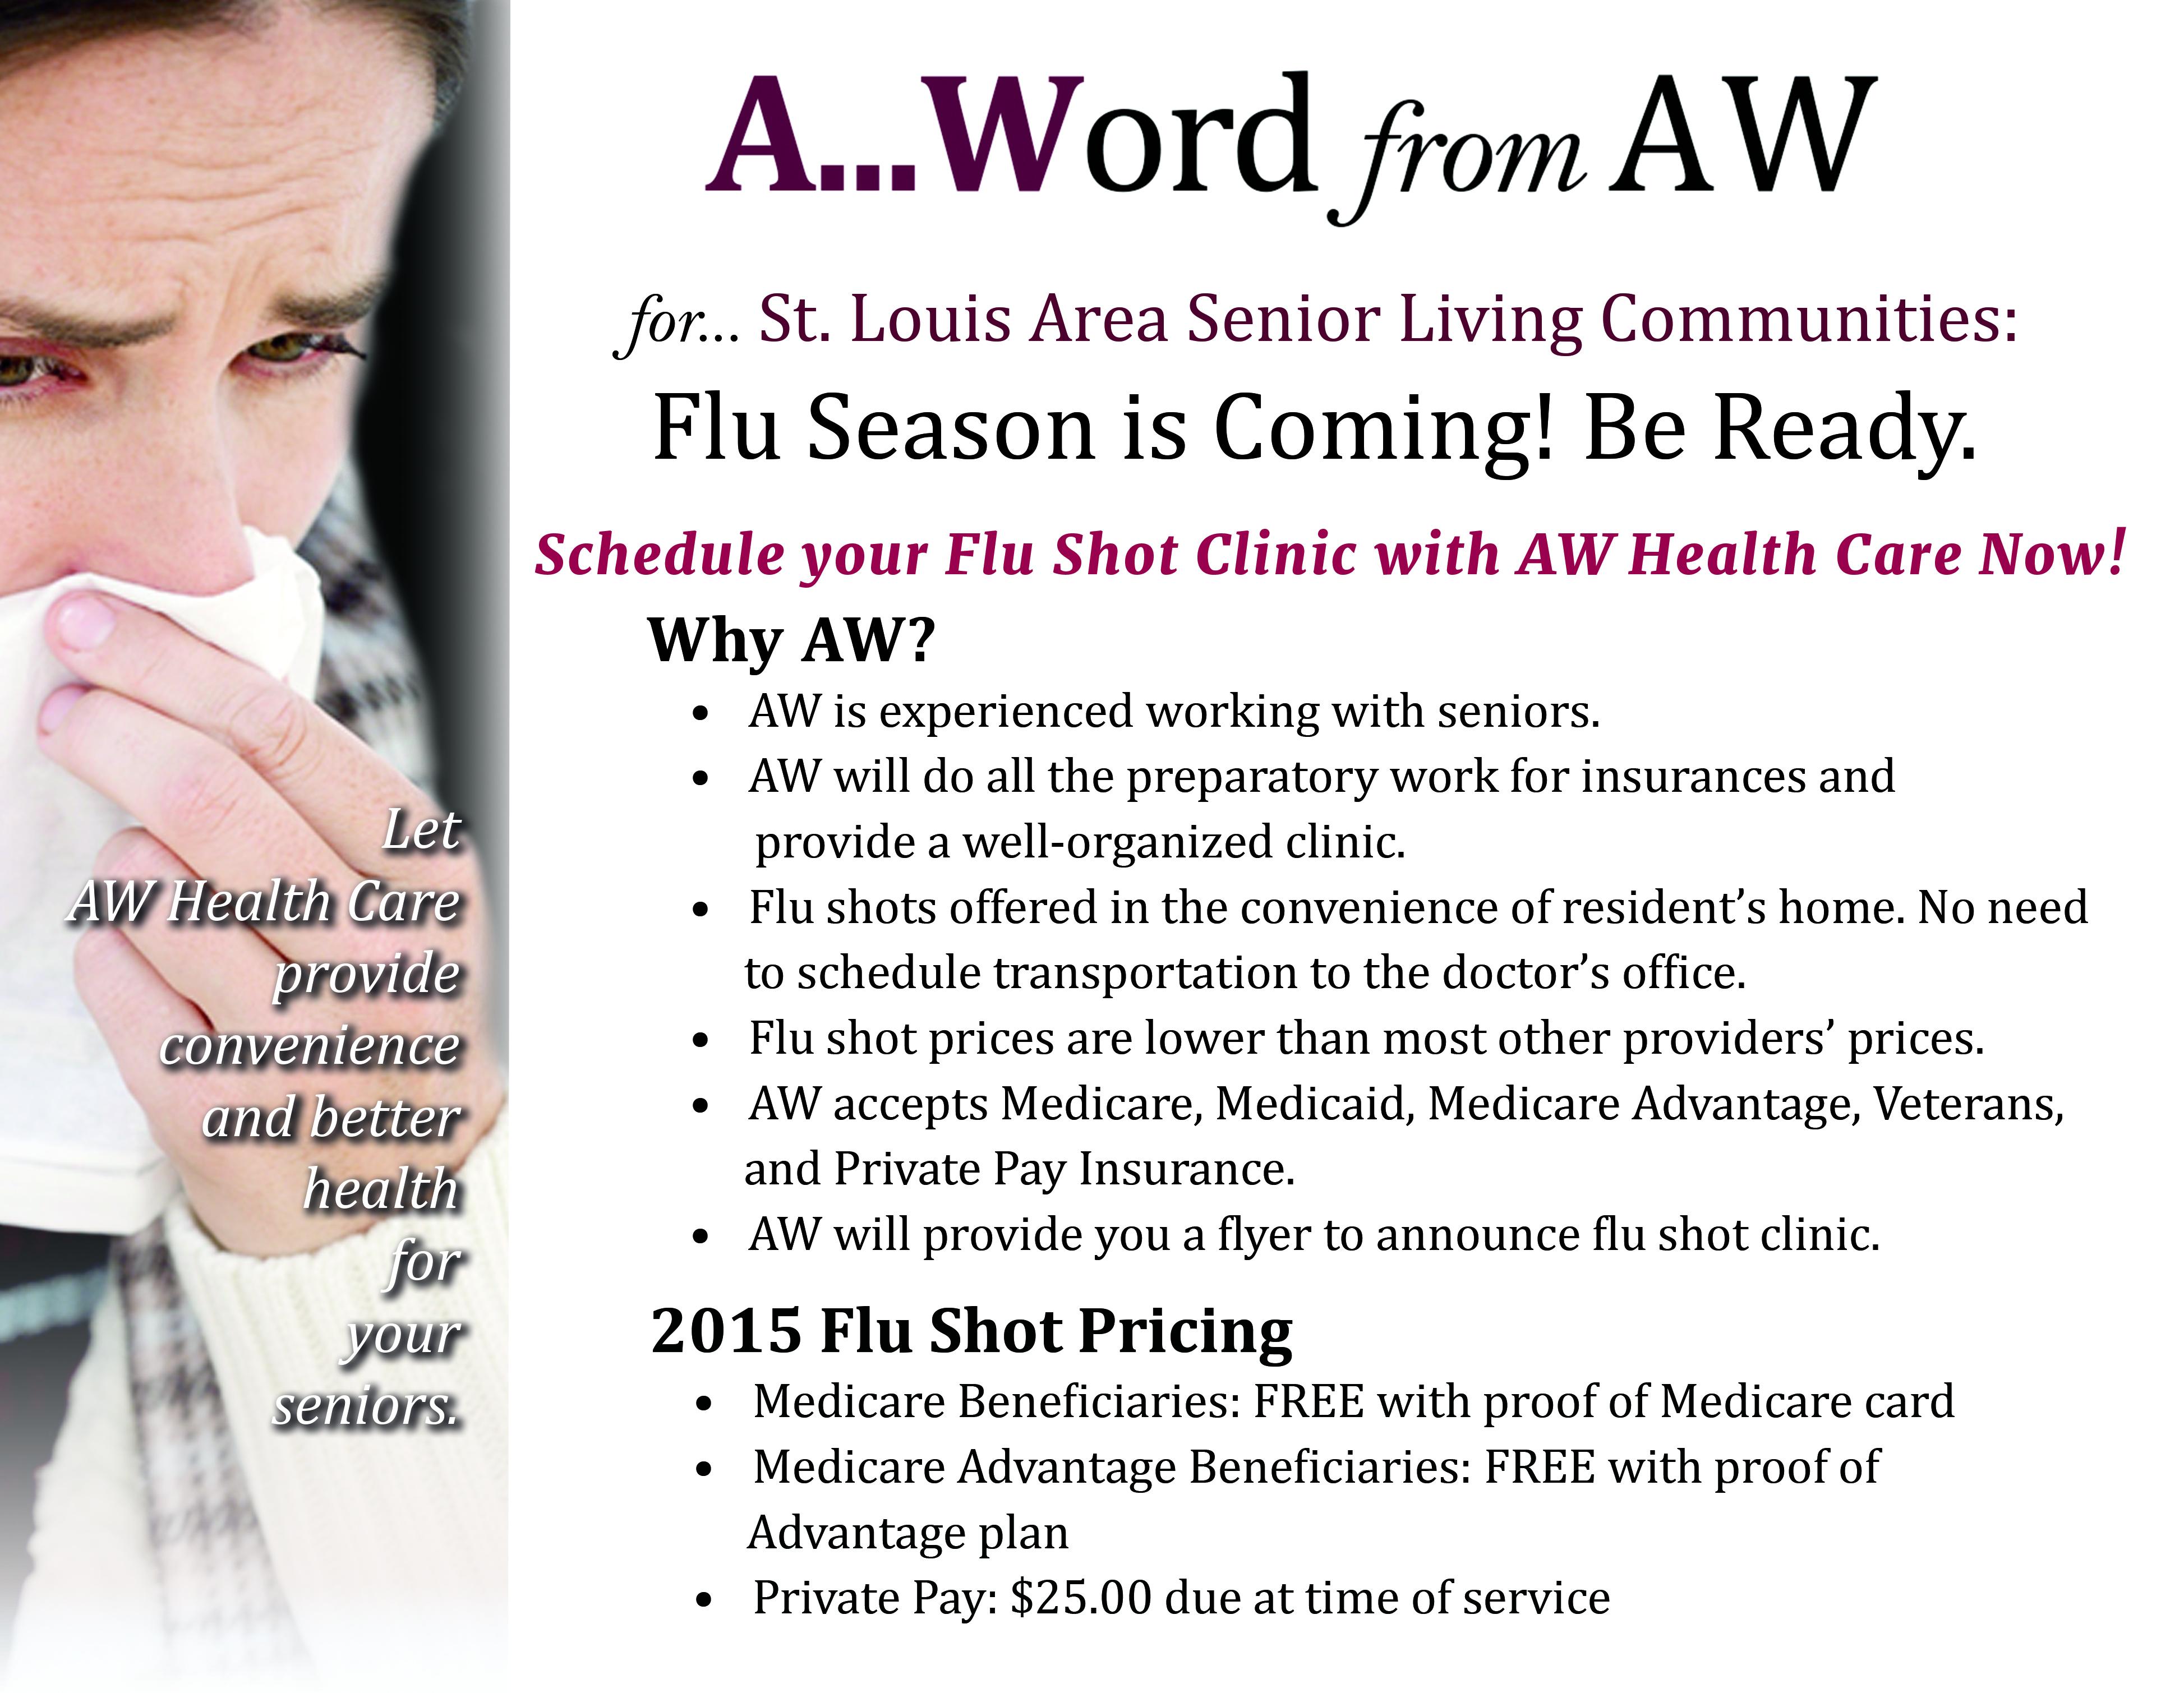 Flu season dates